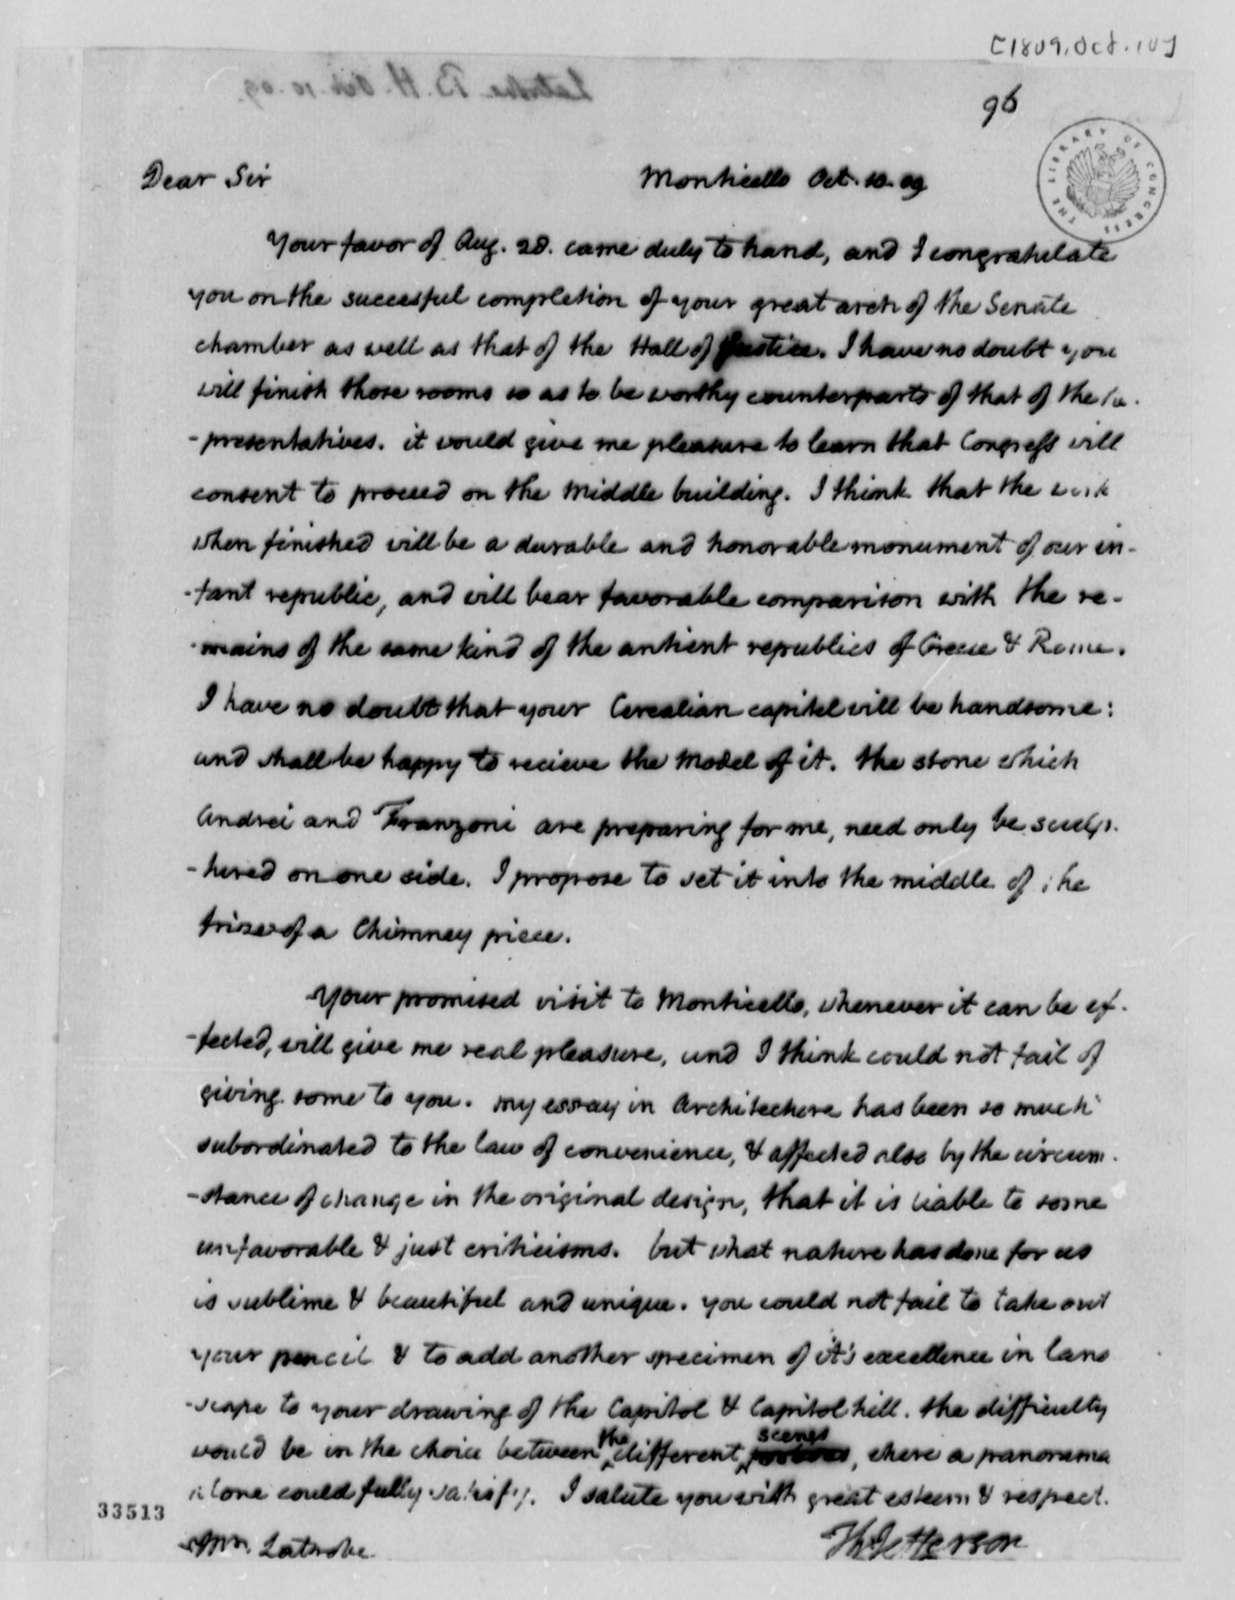 Thomas Jefferson to Benjamin H. Latrobe, October 10, 1809